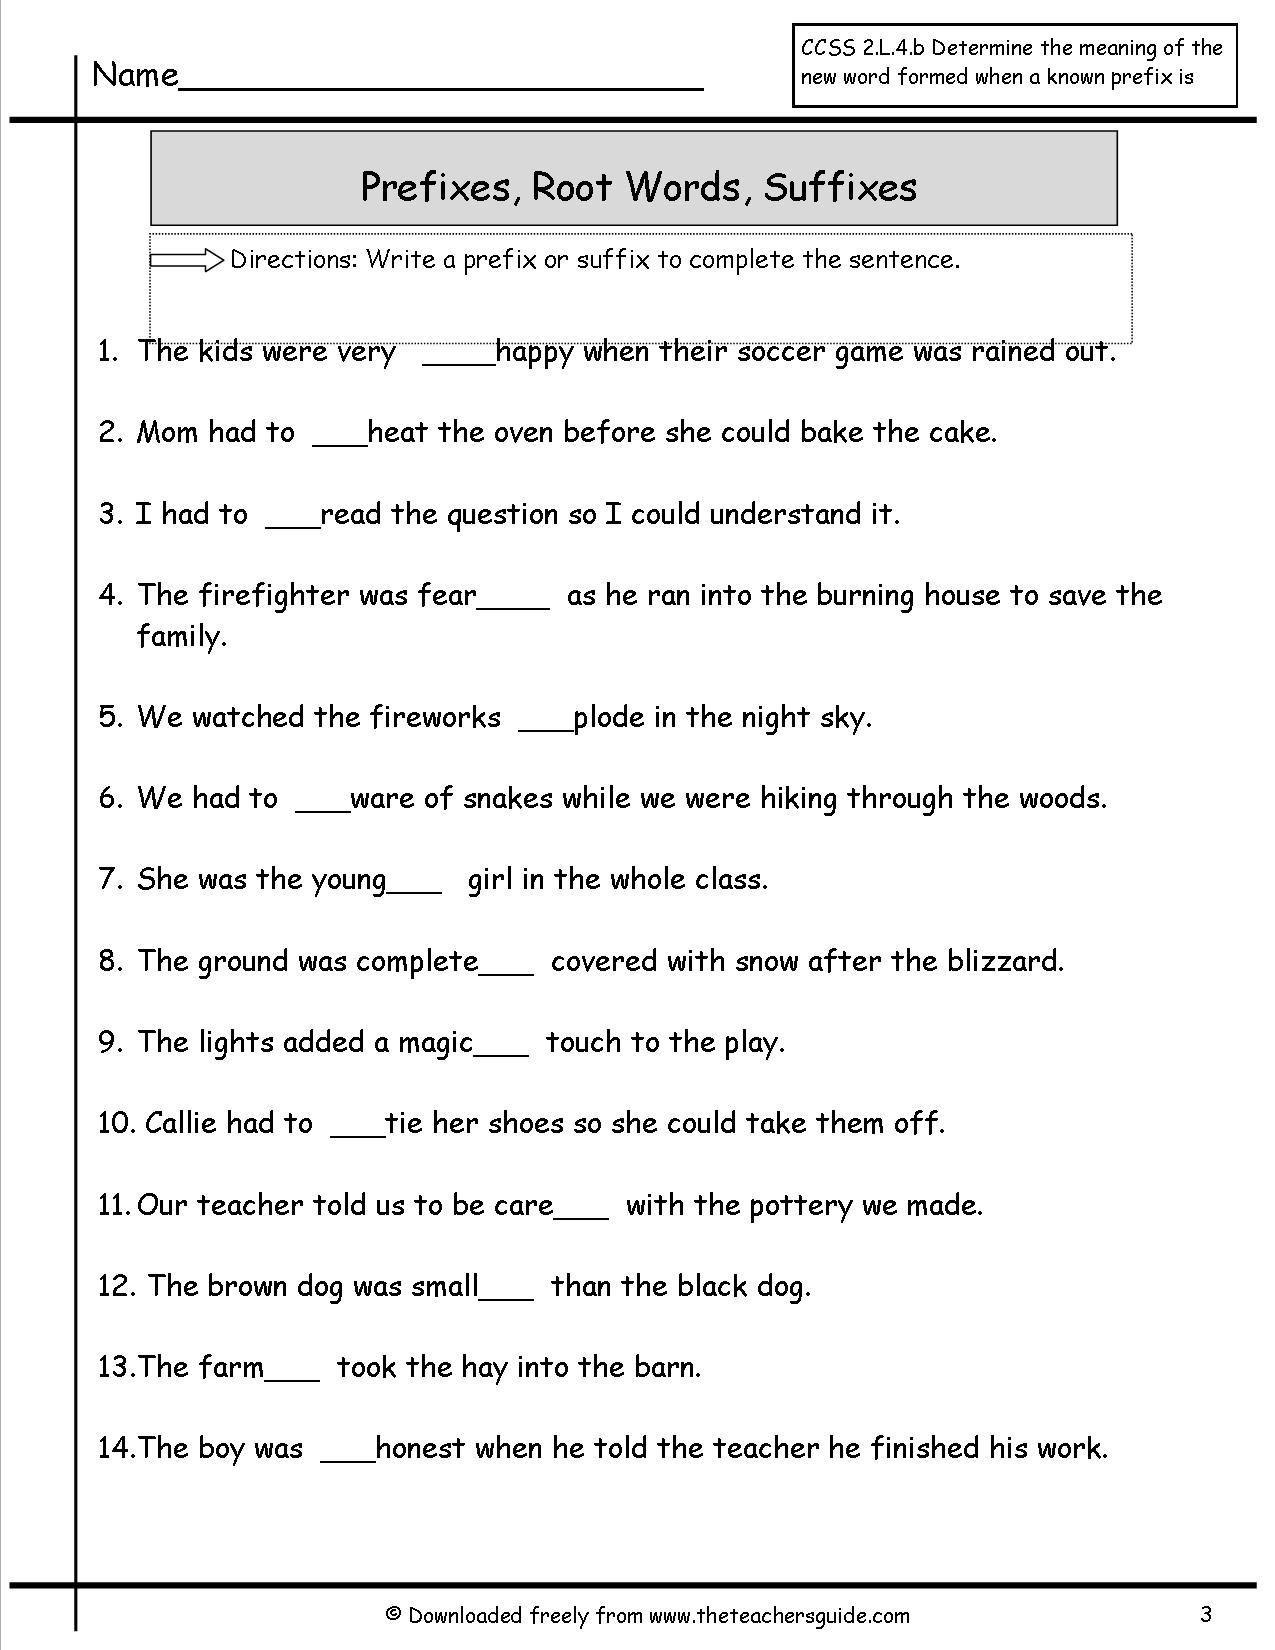 Prefixes Suffixes Worksheet Suffixes Worksheets Prefixes And Suffixes Prefix Worksheet